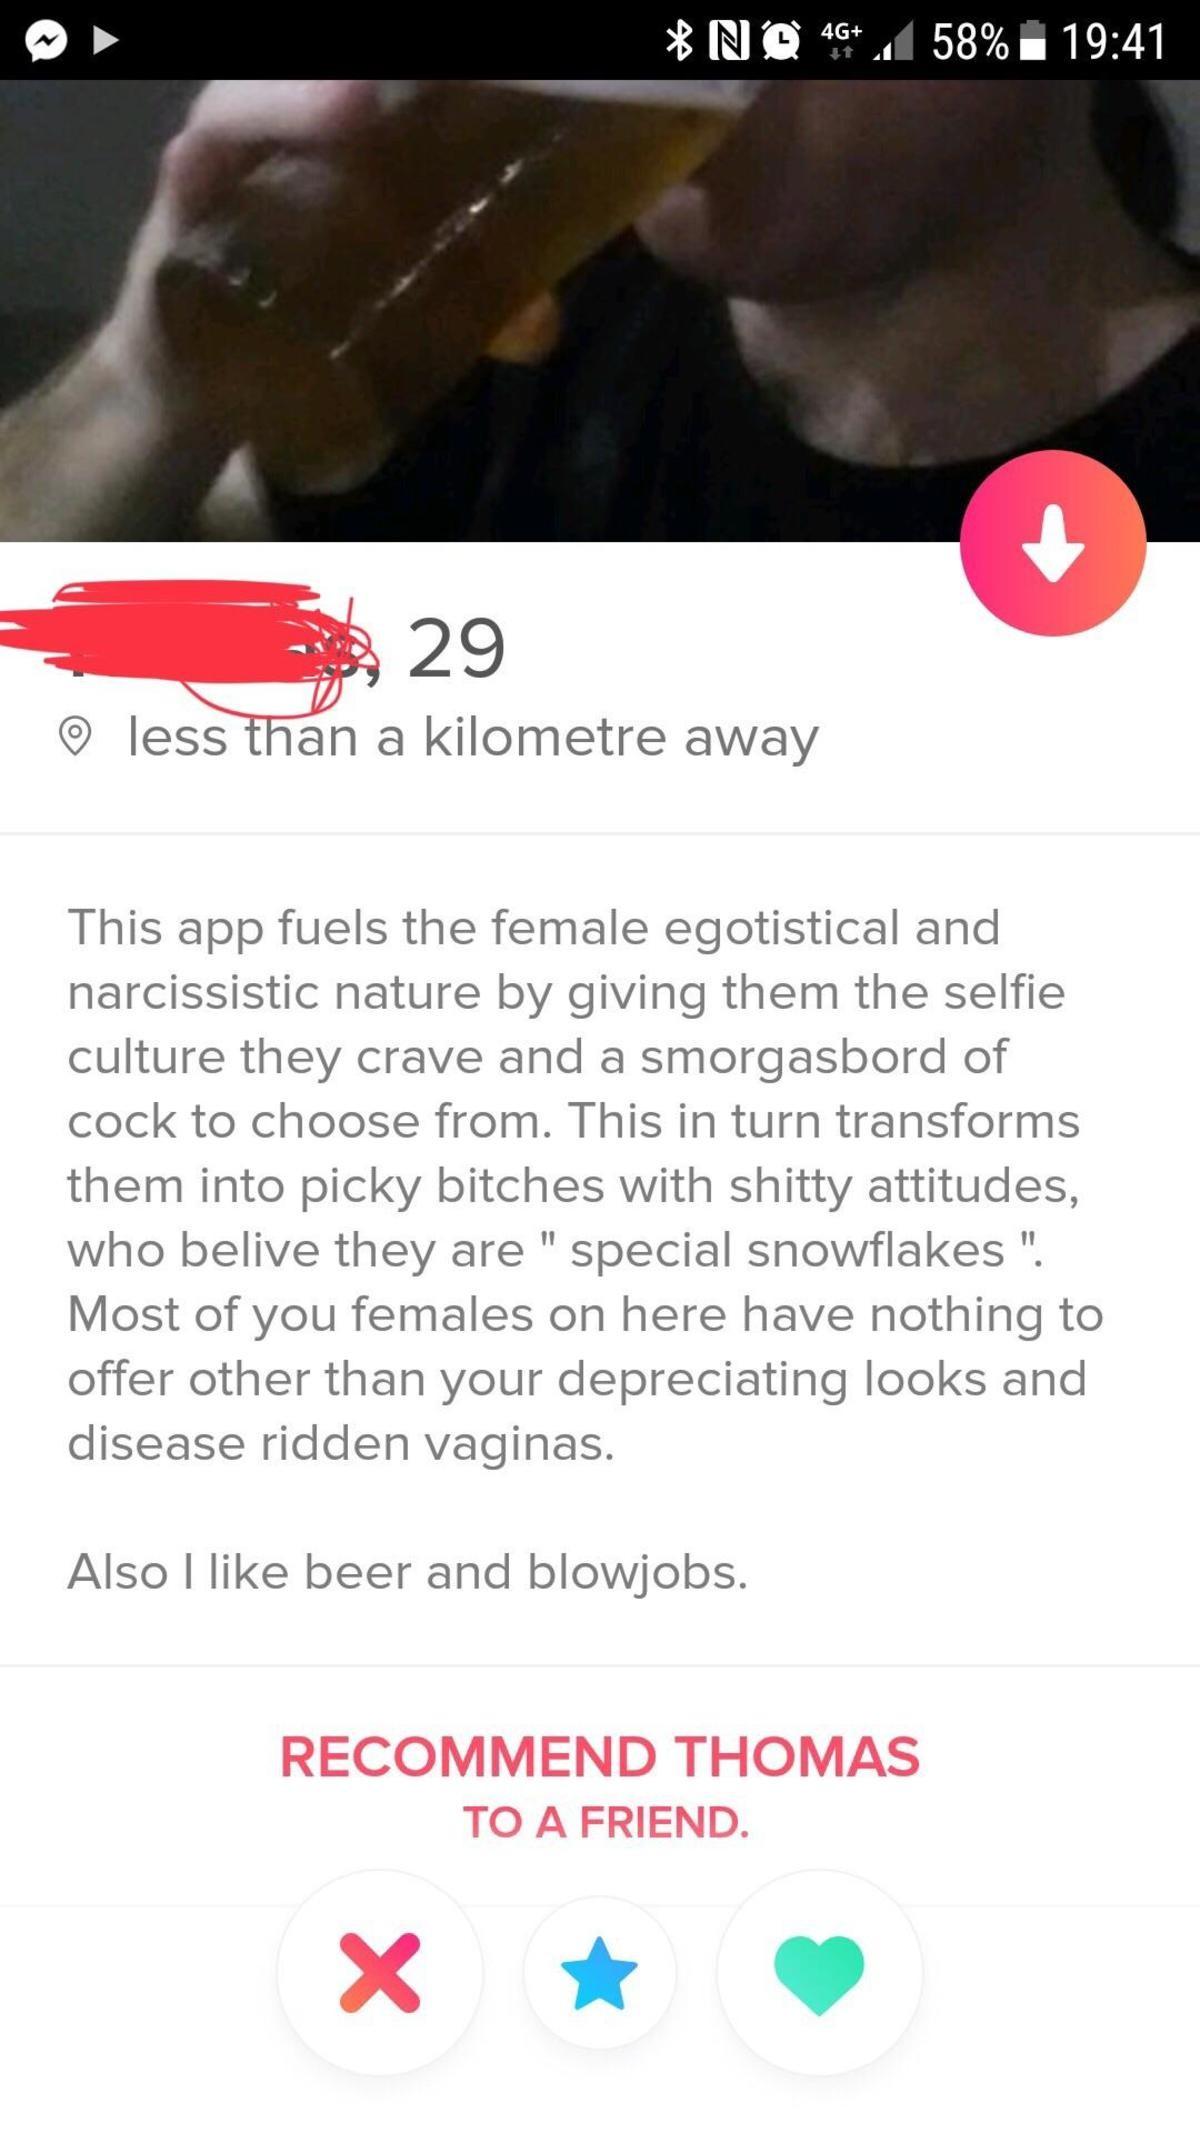 A real ladies man!